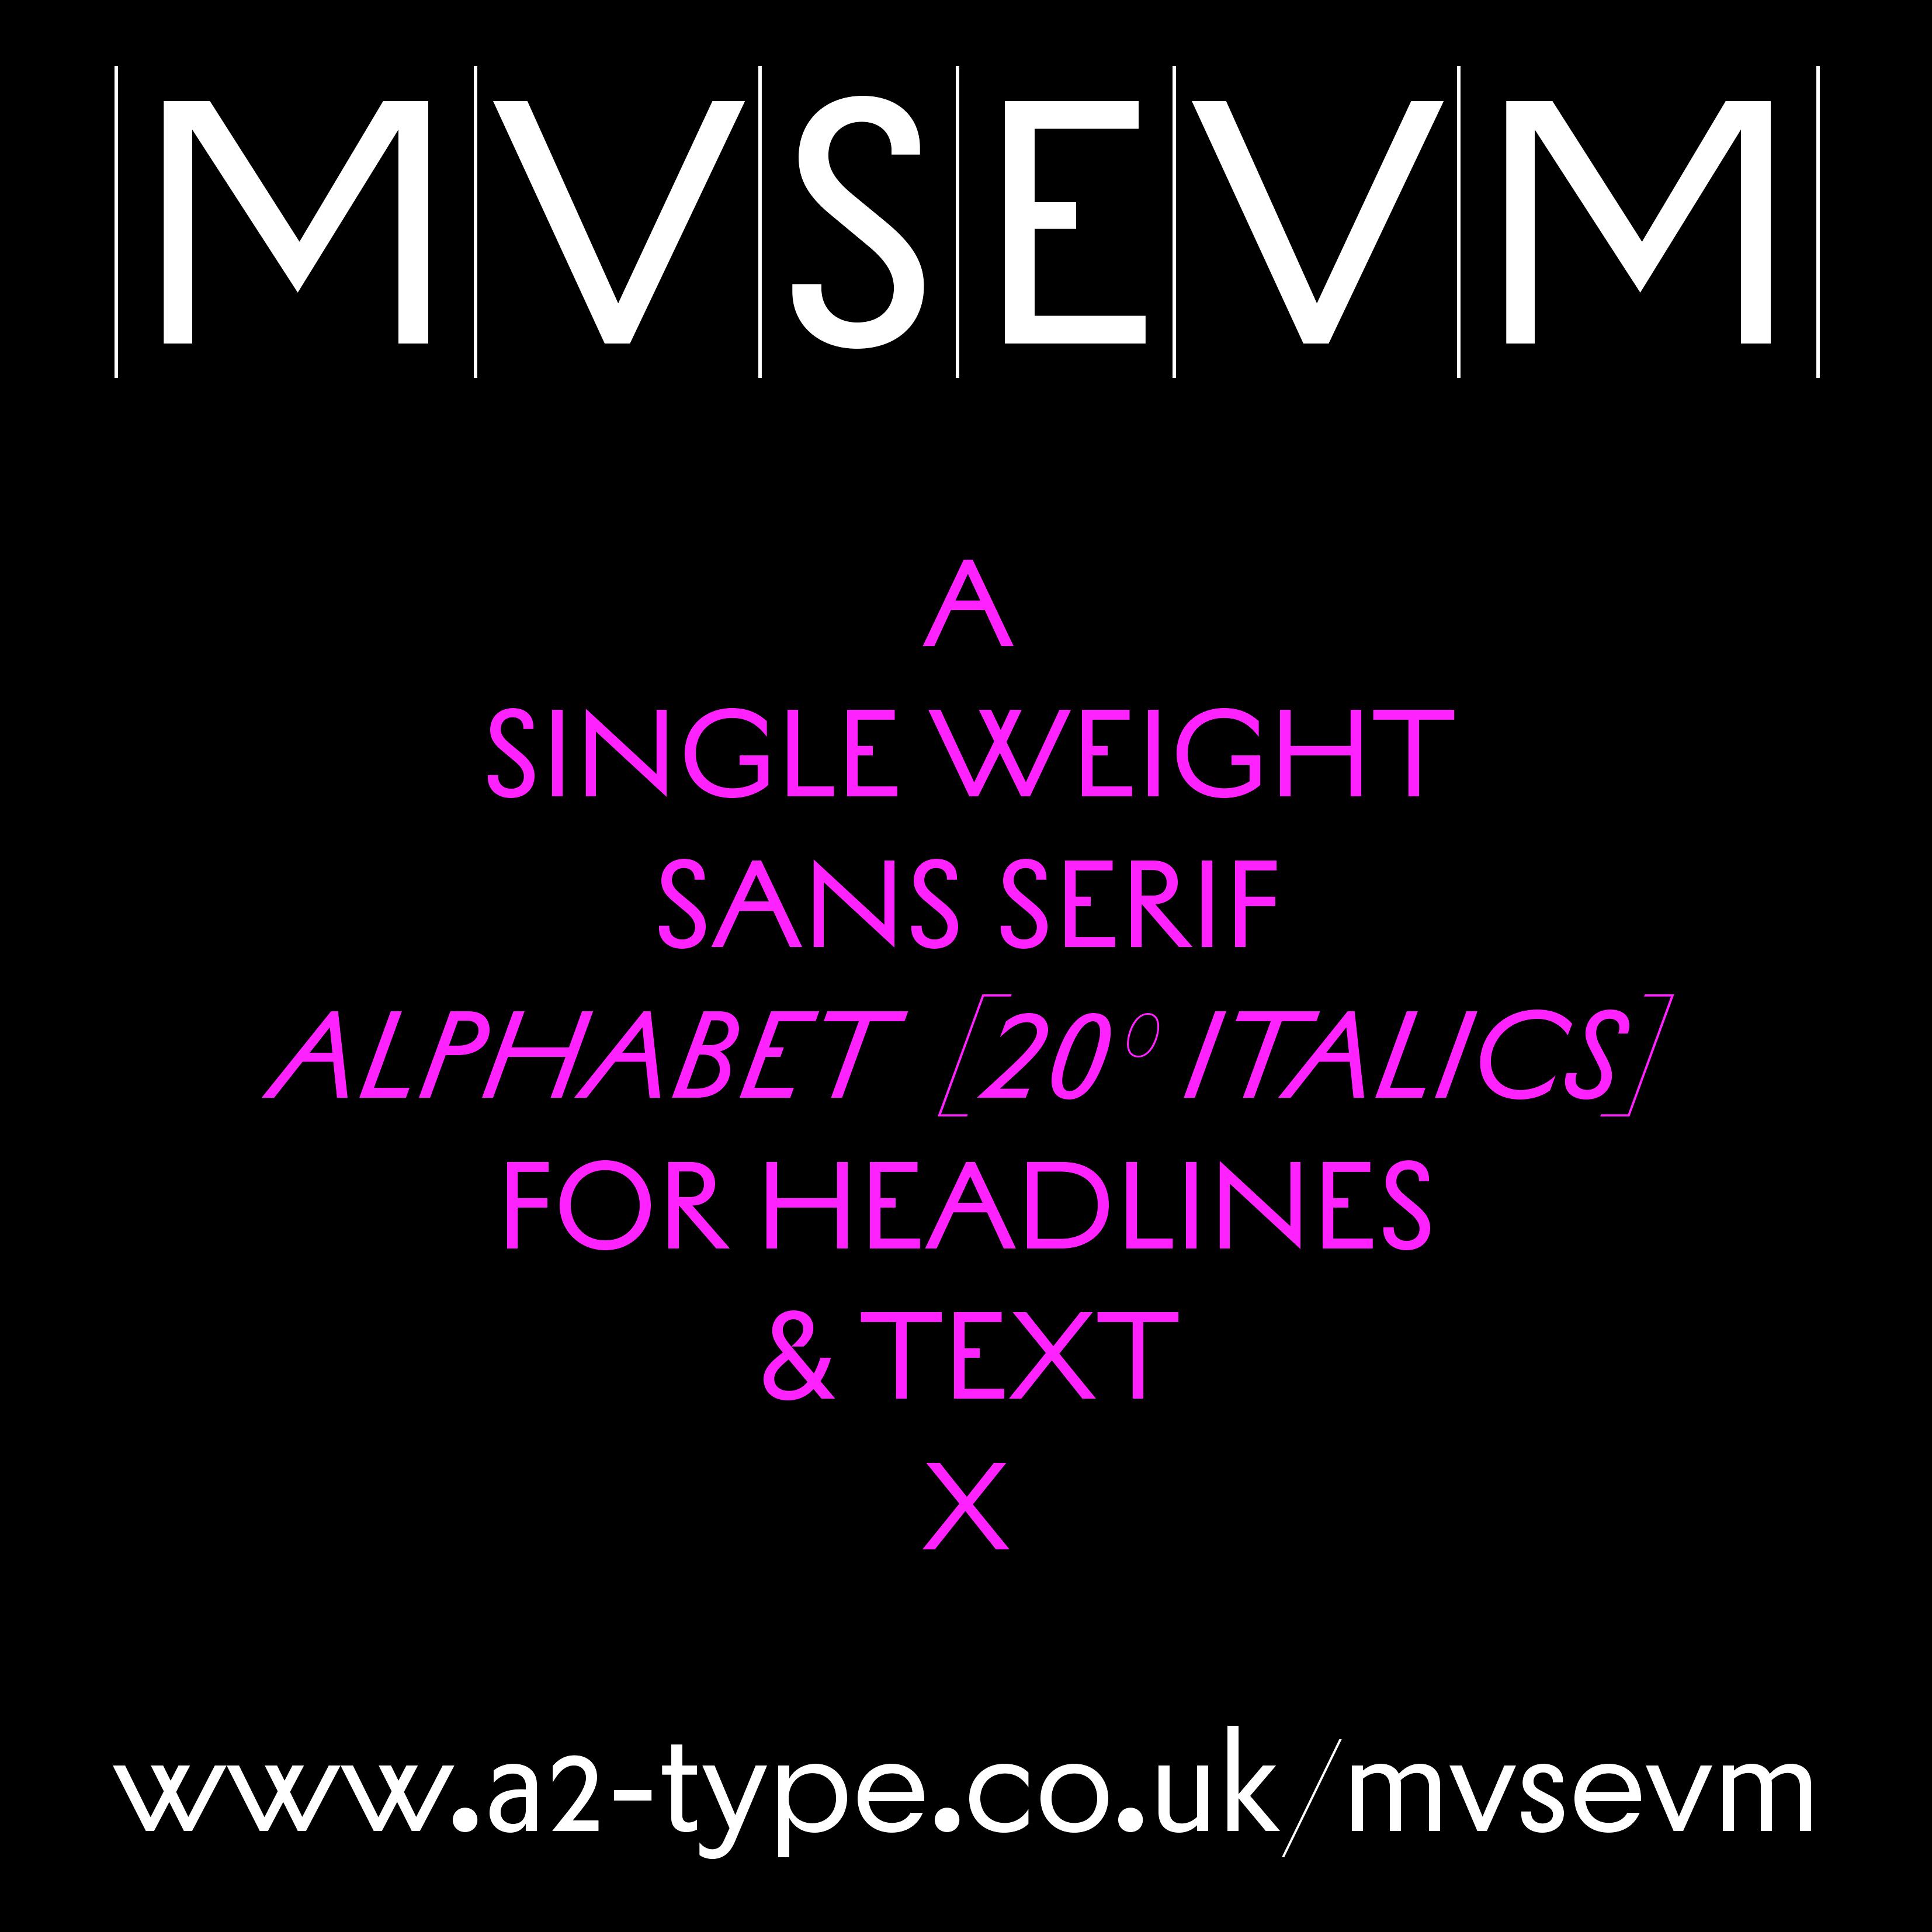 MVSEVM sample